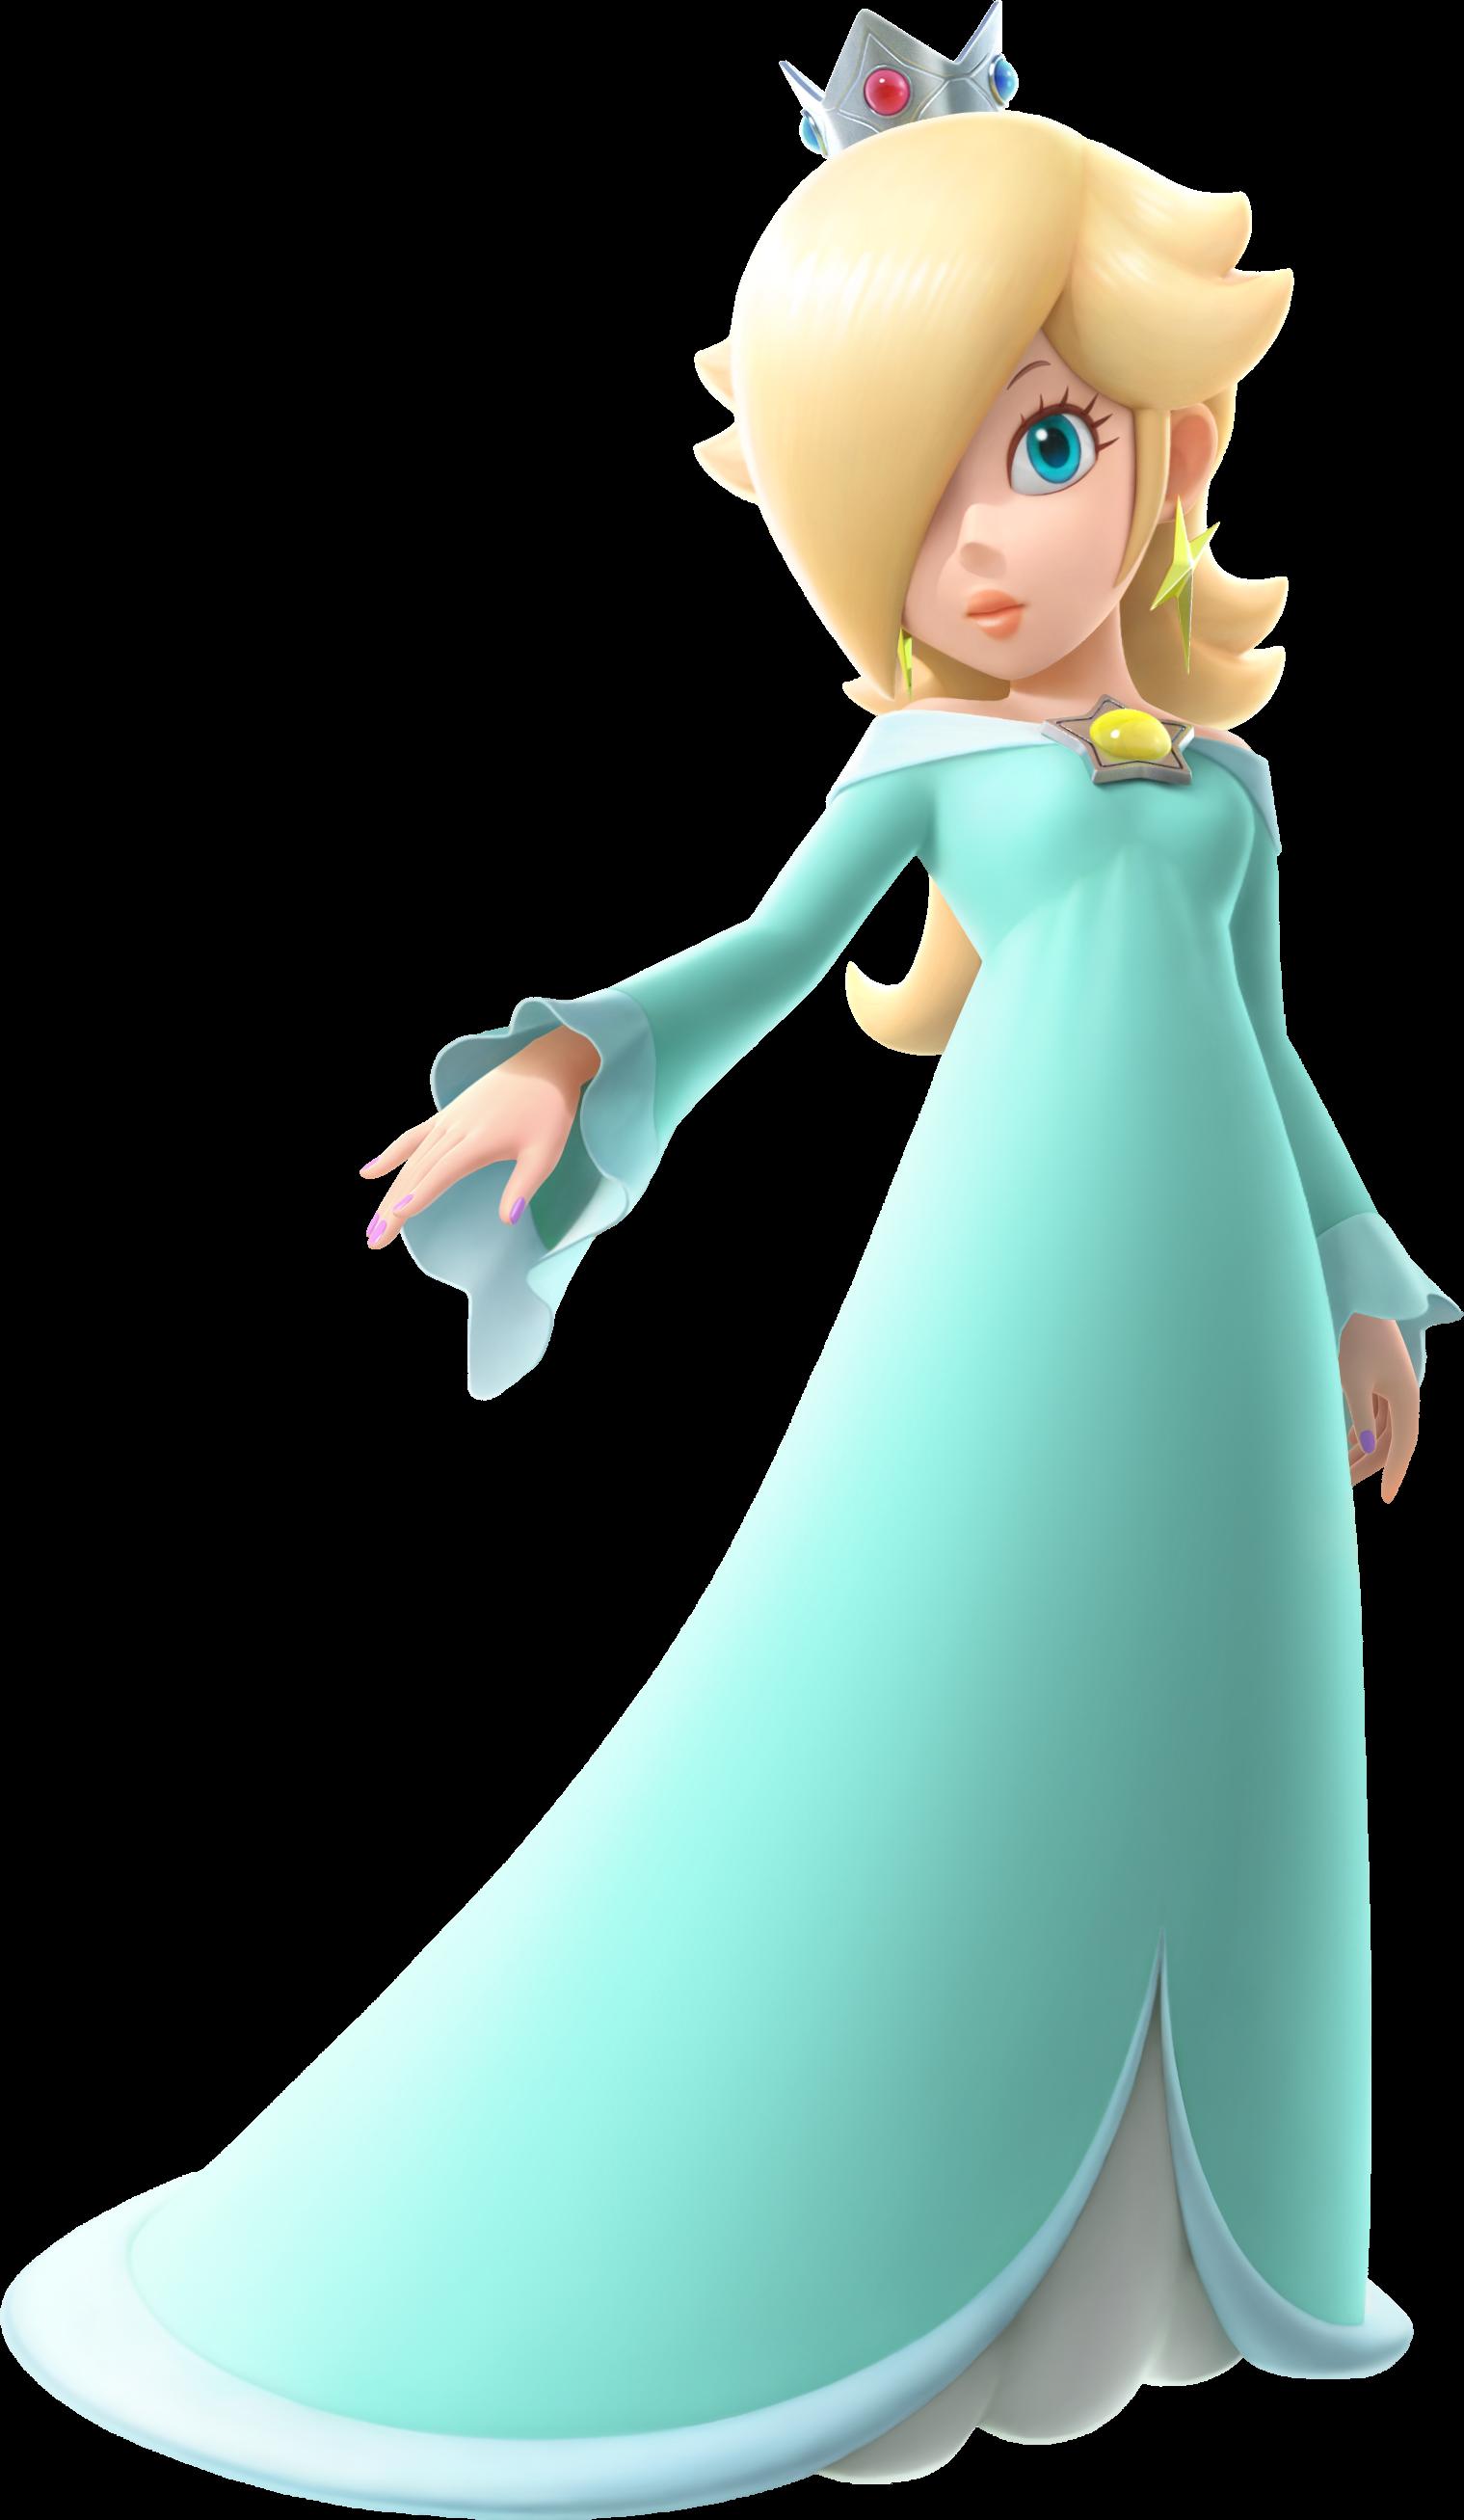 Princesa Rosalina/Estela | Super Mario Wiki | FANDOM powered by Wikia